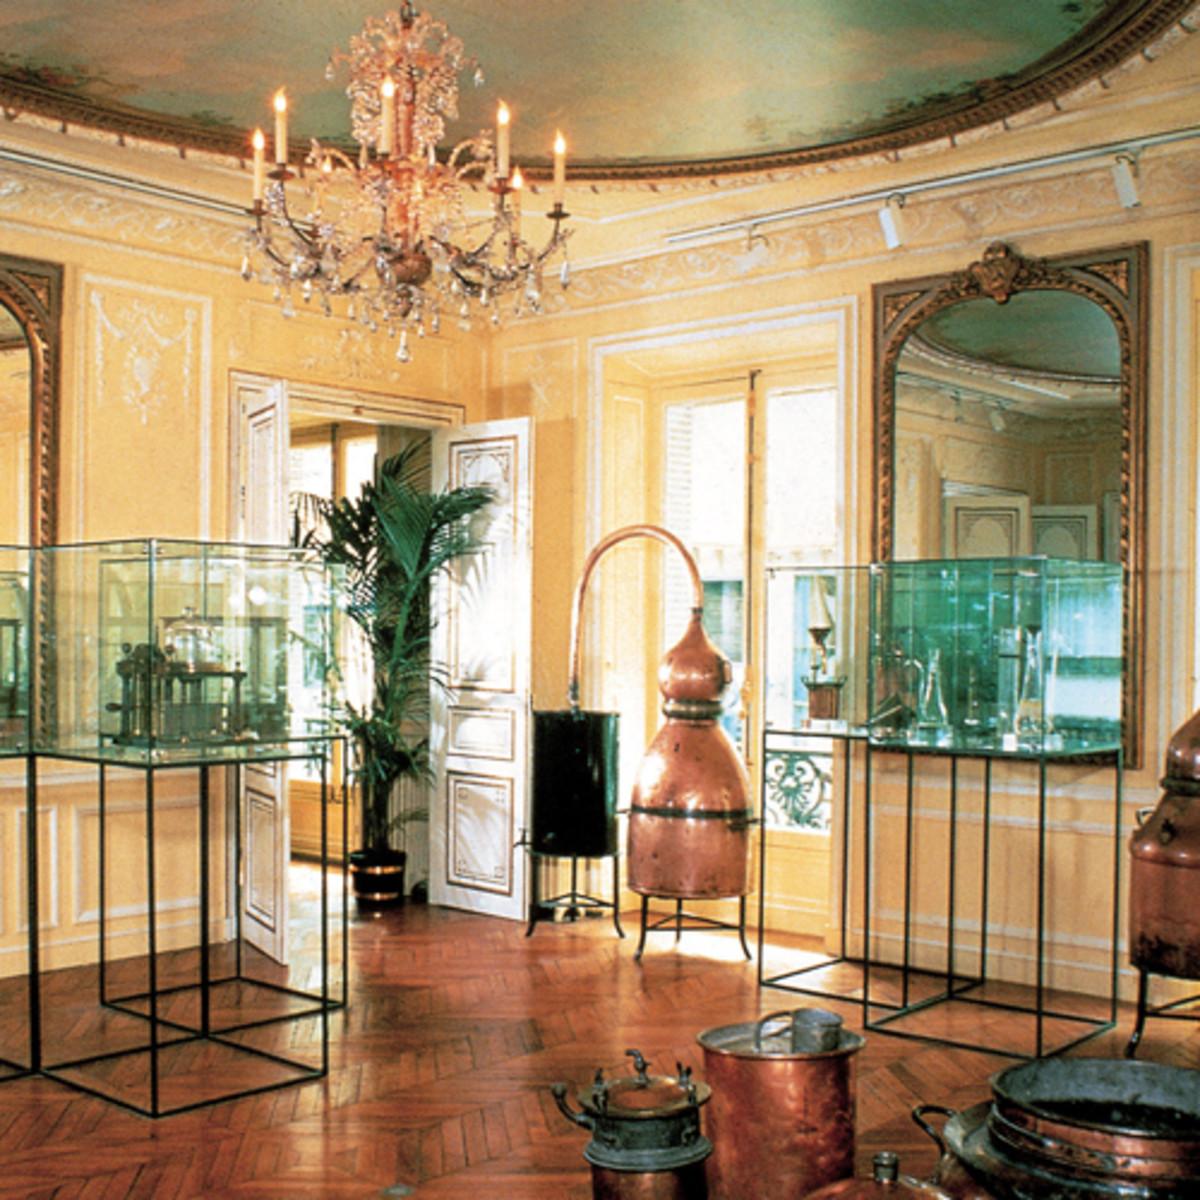 Find Unusual Paris Museums